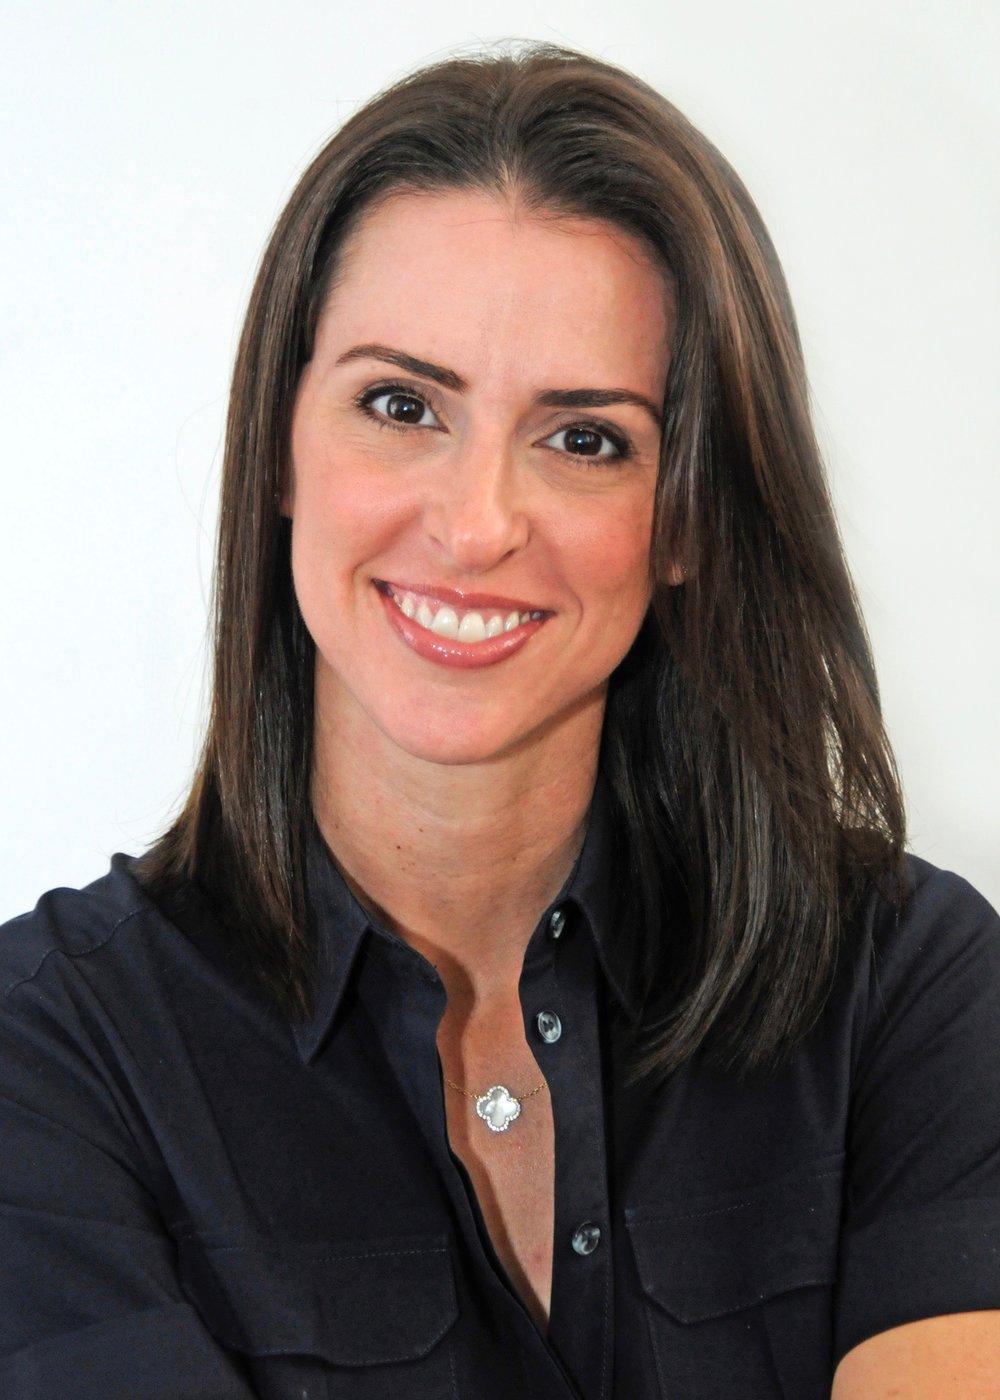 Holly Zawyer<br>Managing Director, Miami</br>